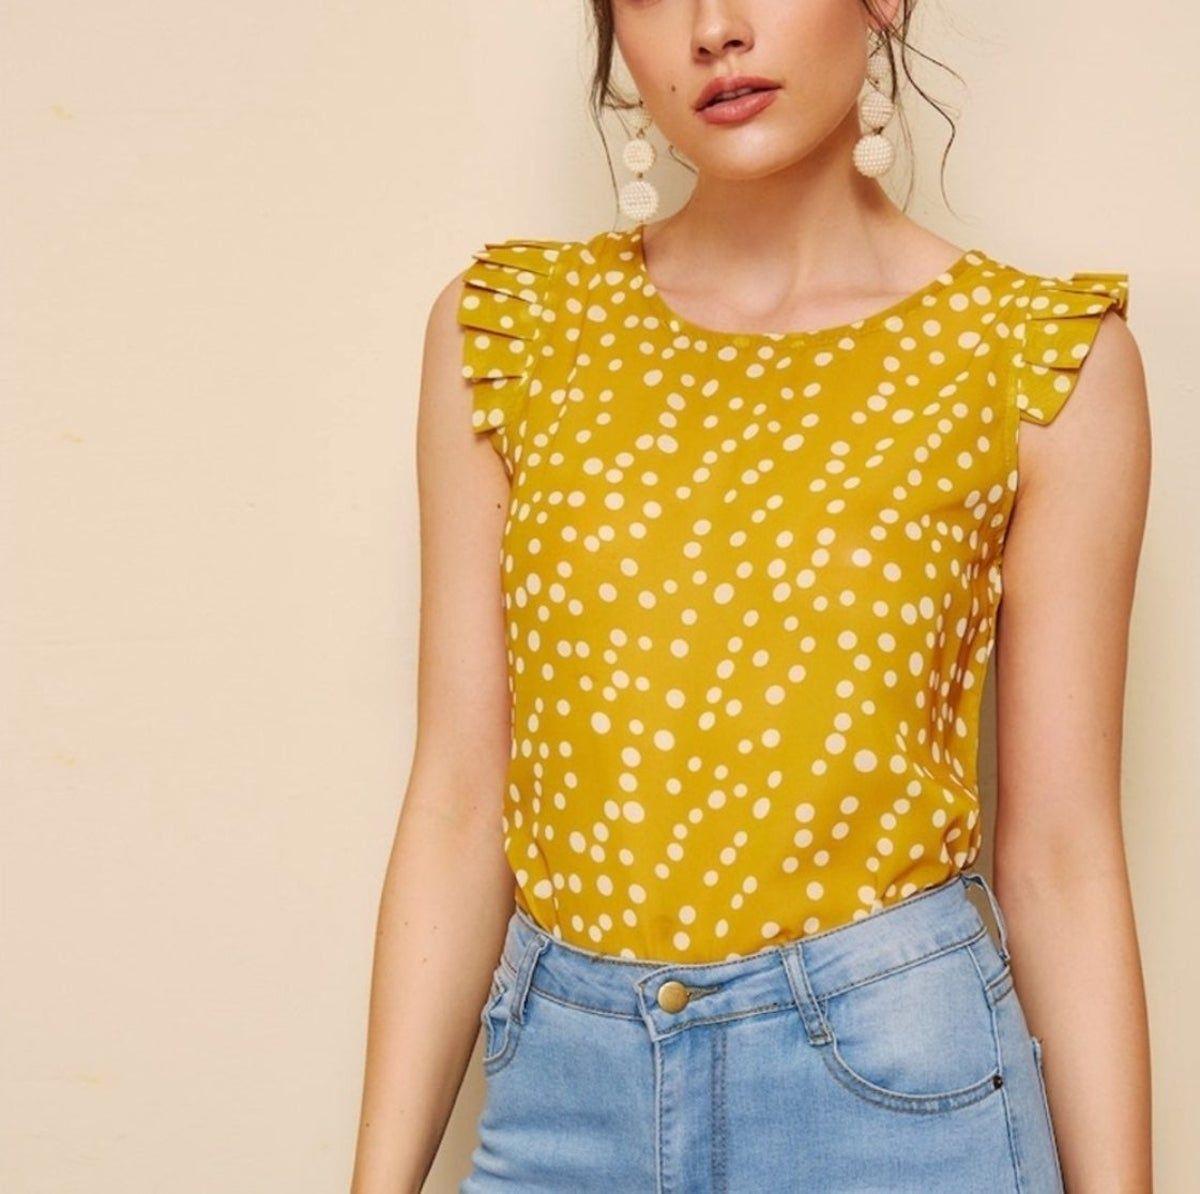 Women Sleeveless Polka Dot Top Button Back Shell Frilled Armhole Chiffon Blouses